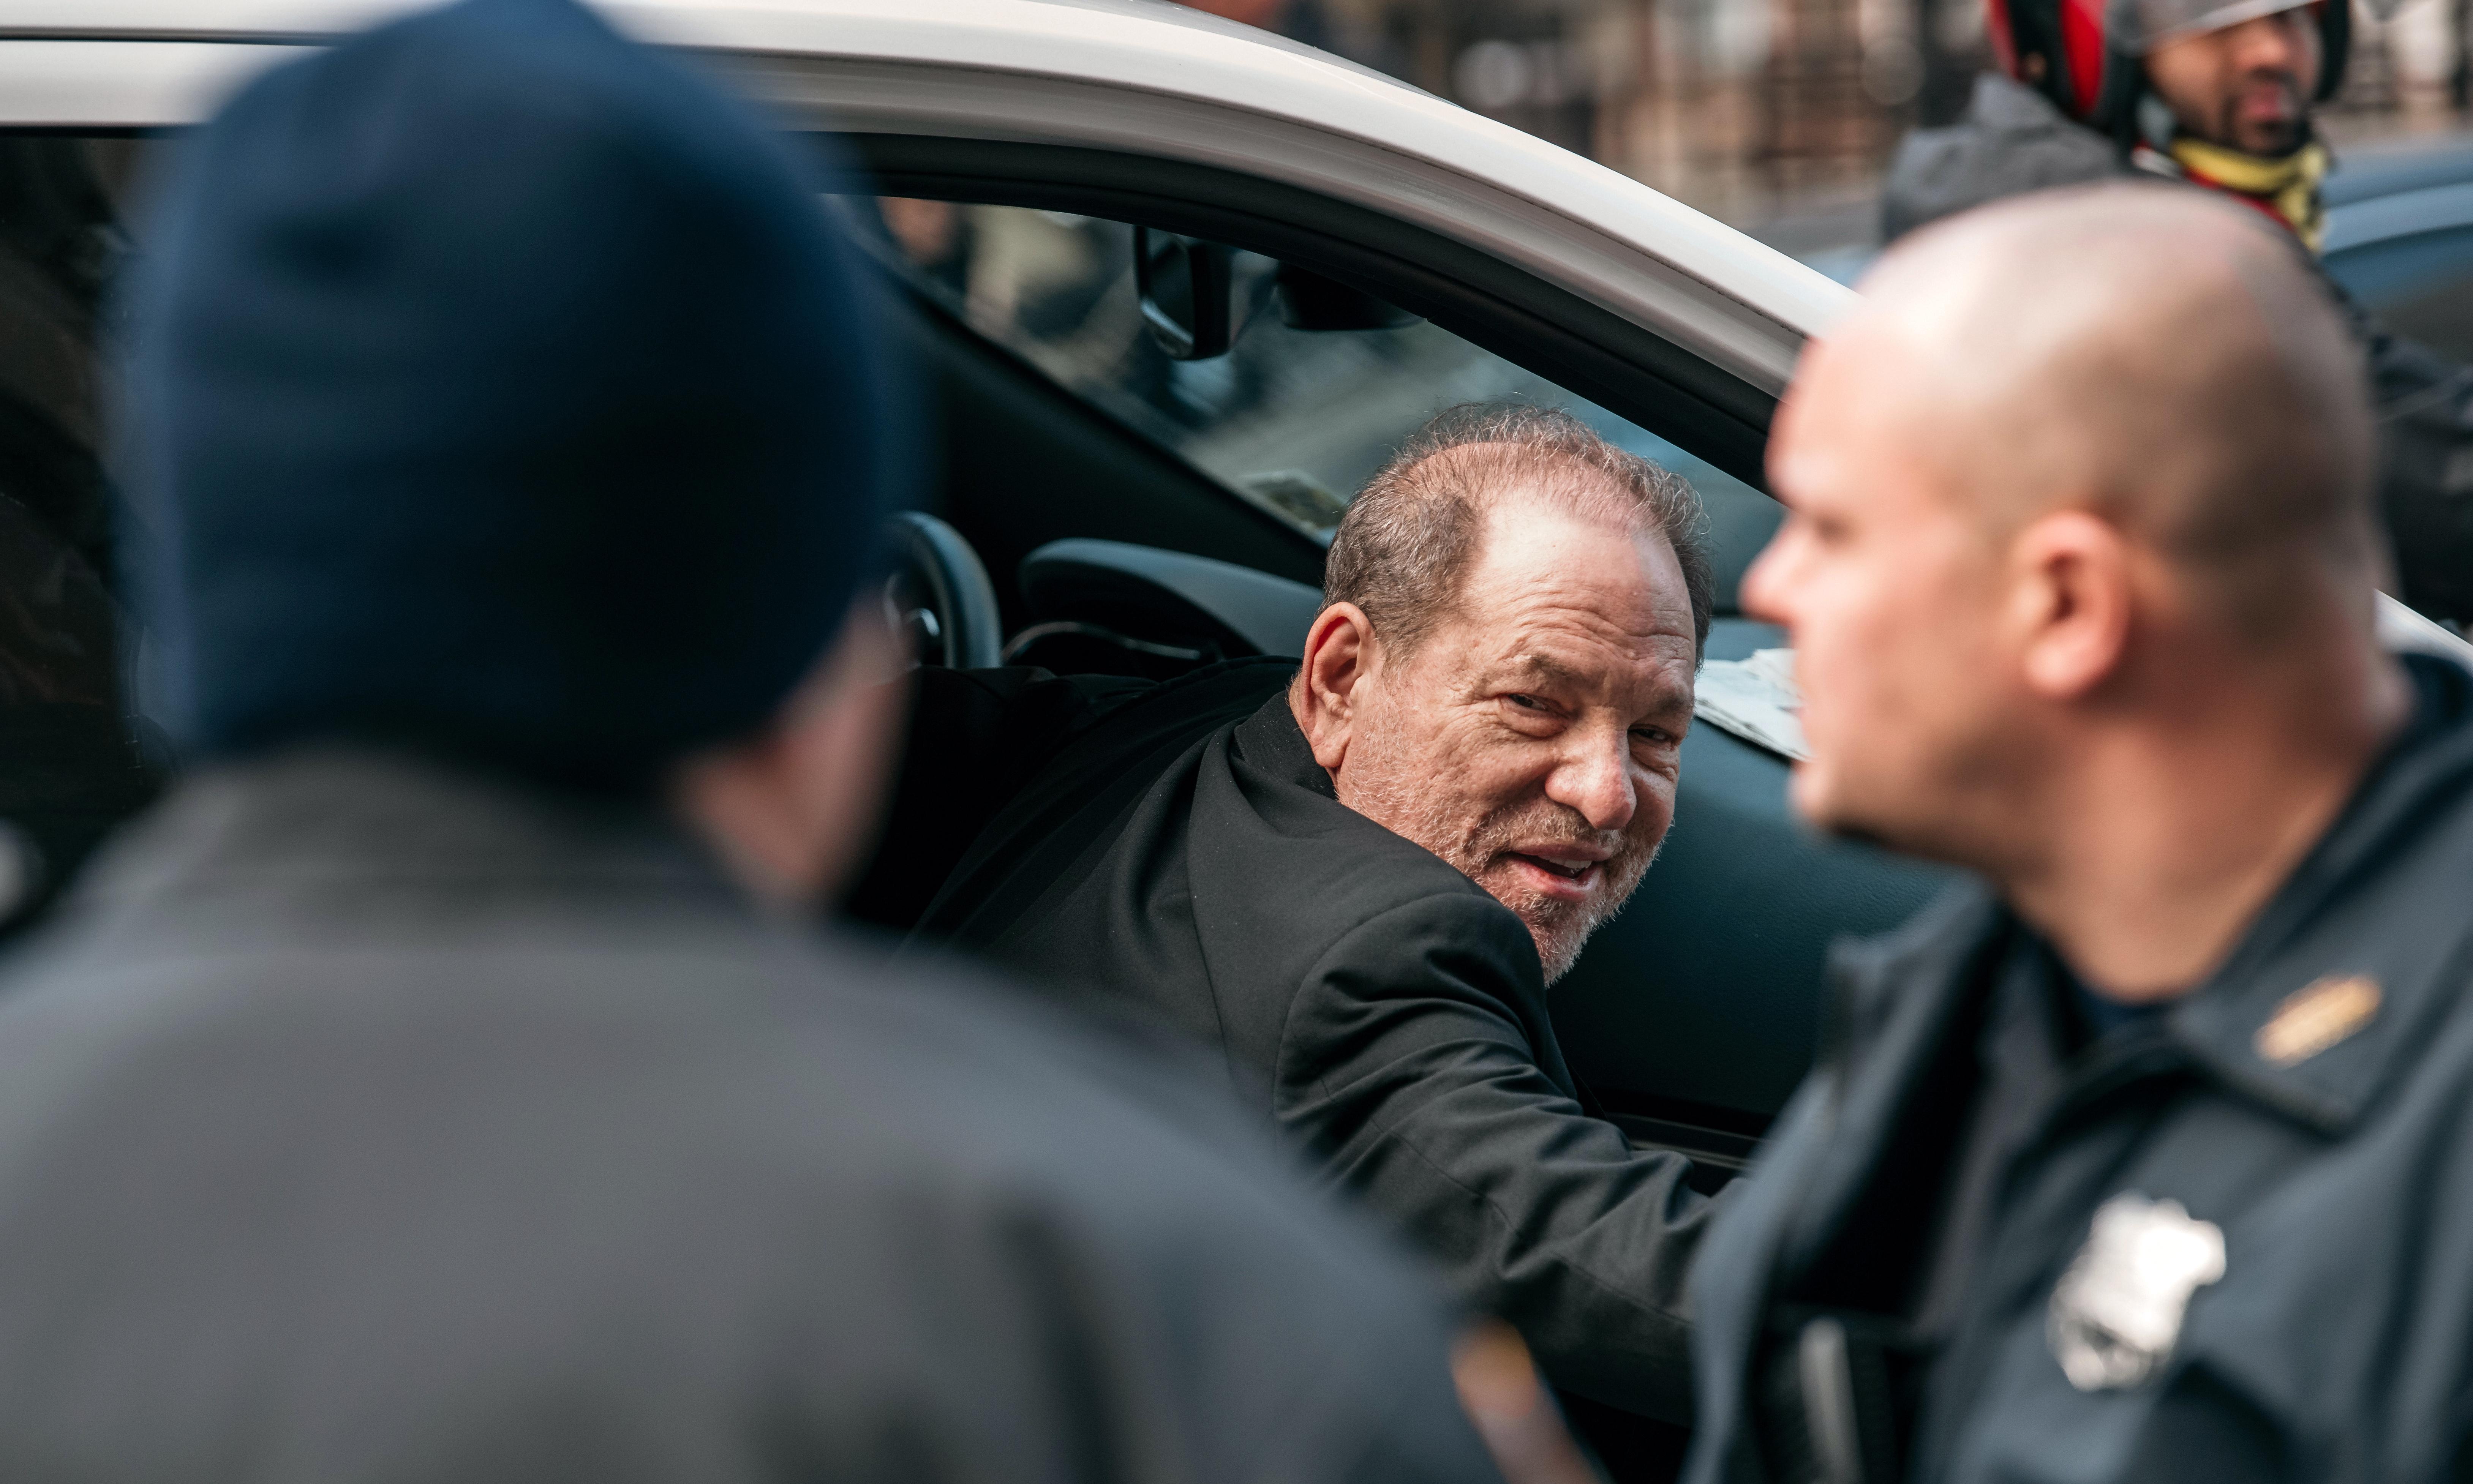 Harvey Weinstein trial is 'not a referendum on #MeToo', says judge